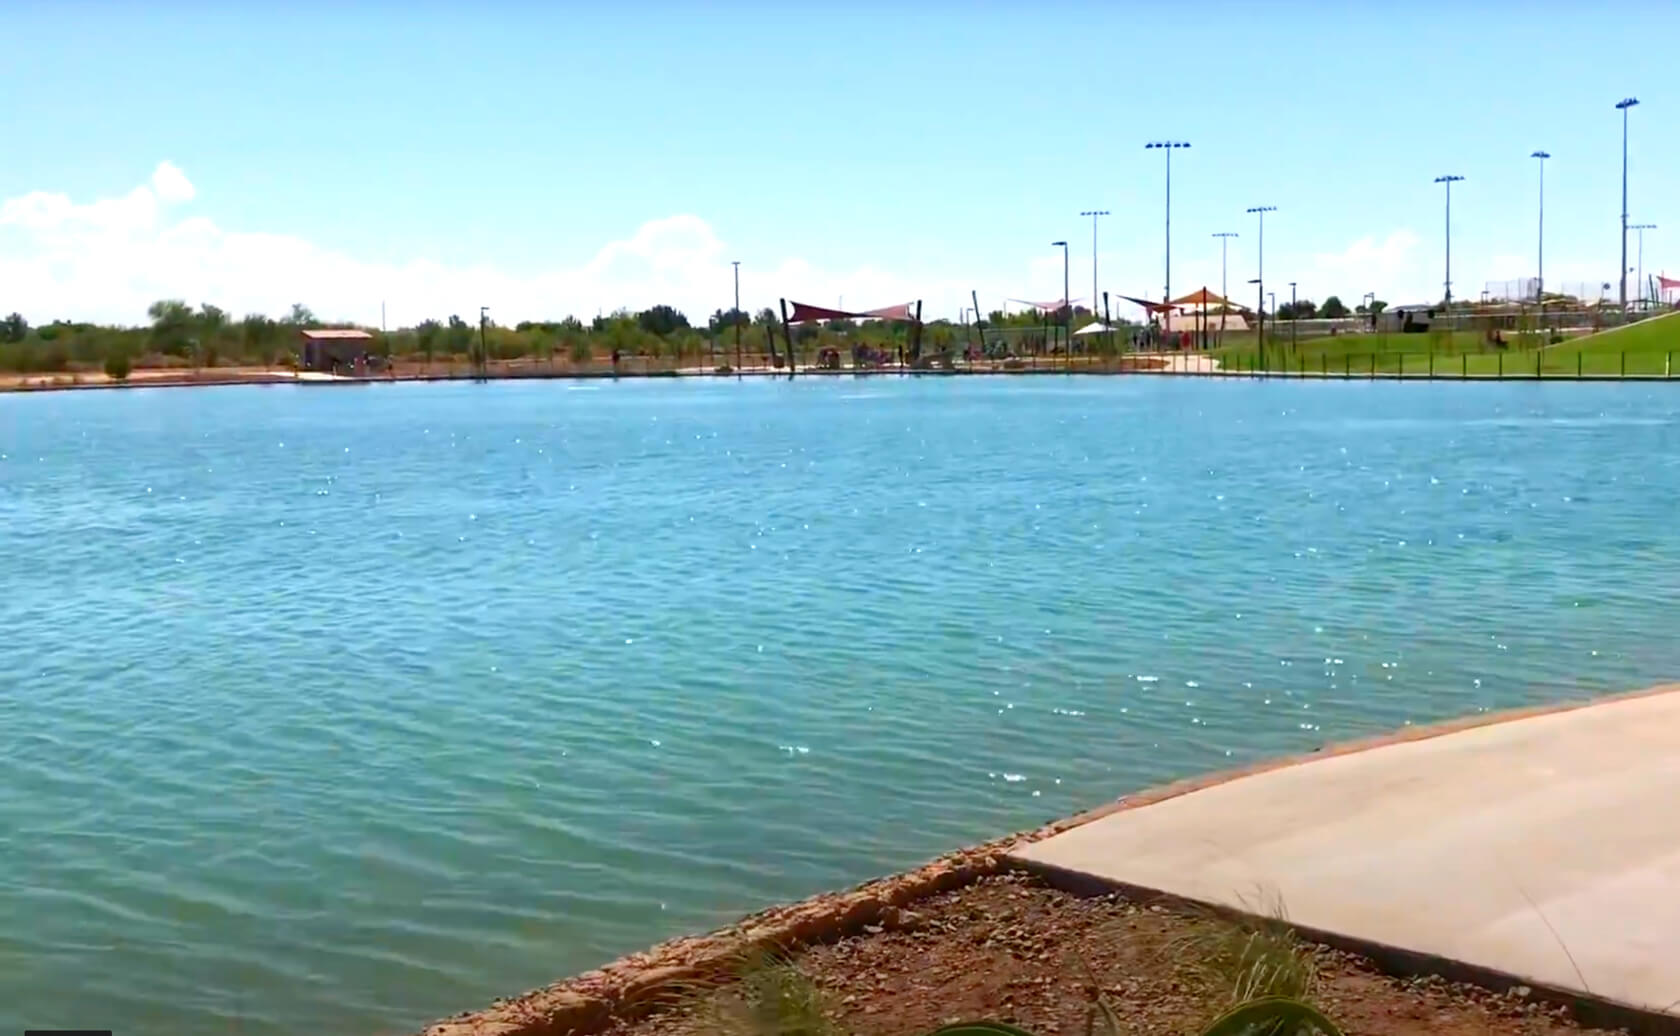 Mansel-Carter-Oasis-Lake-fishing-guide-report-queen-creek-az-021